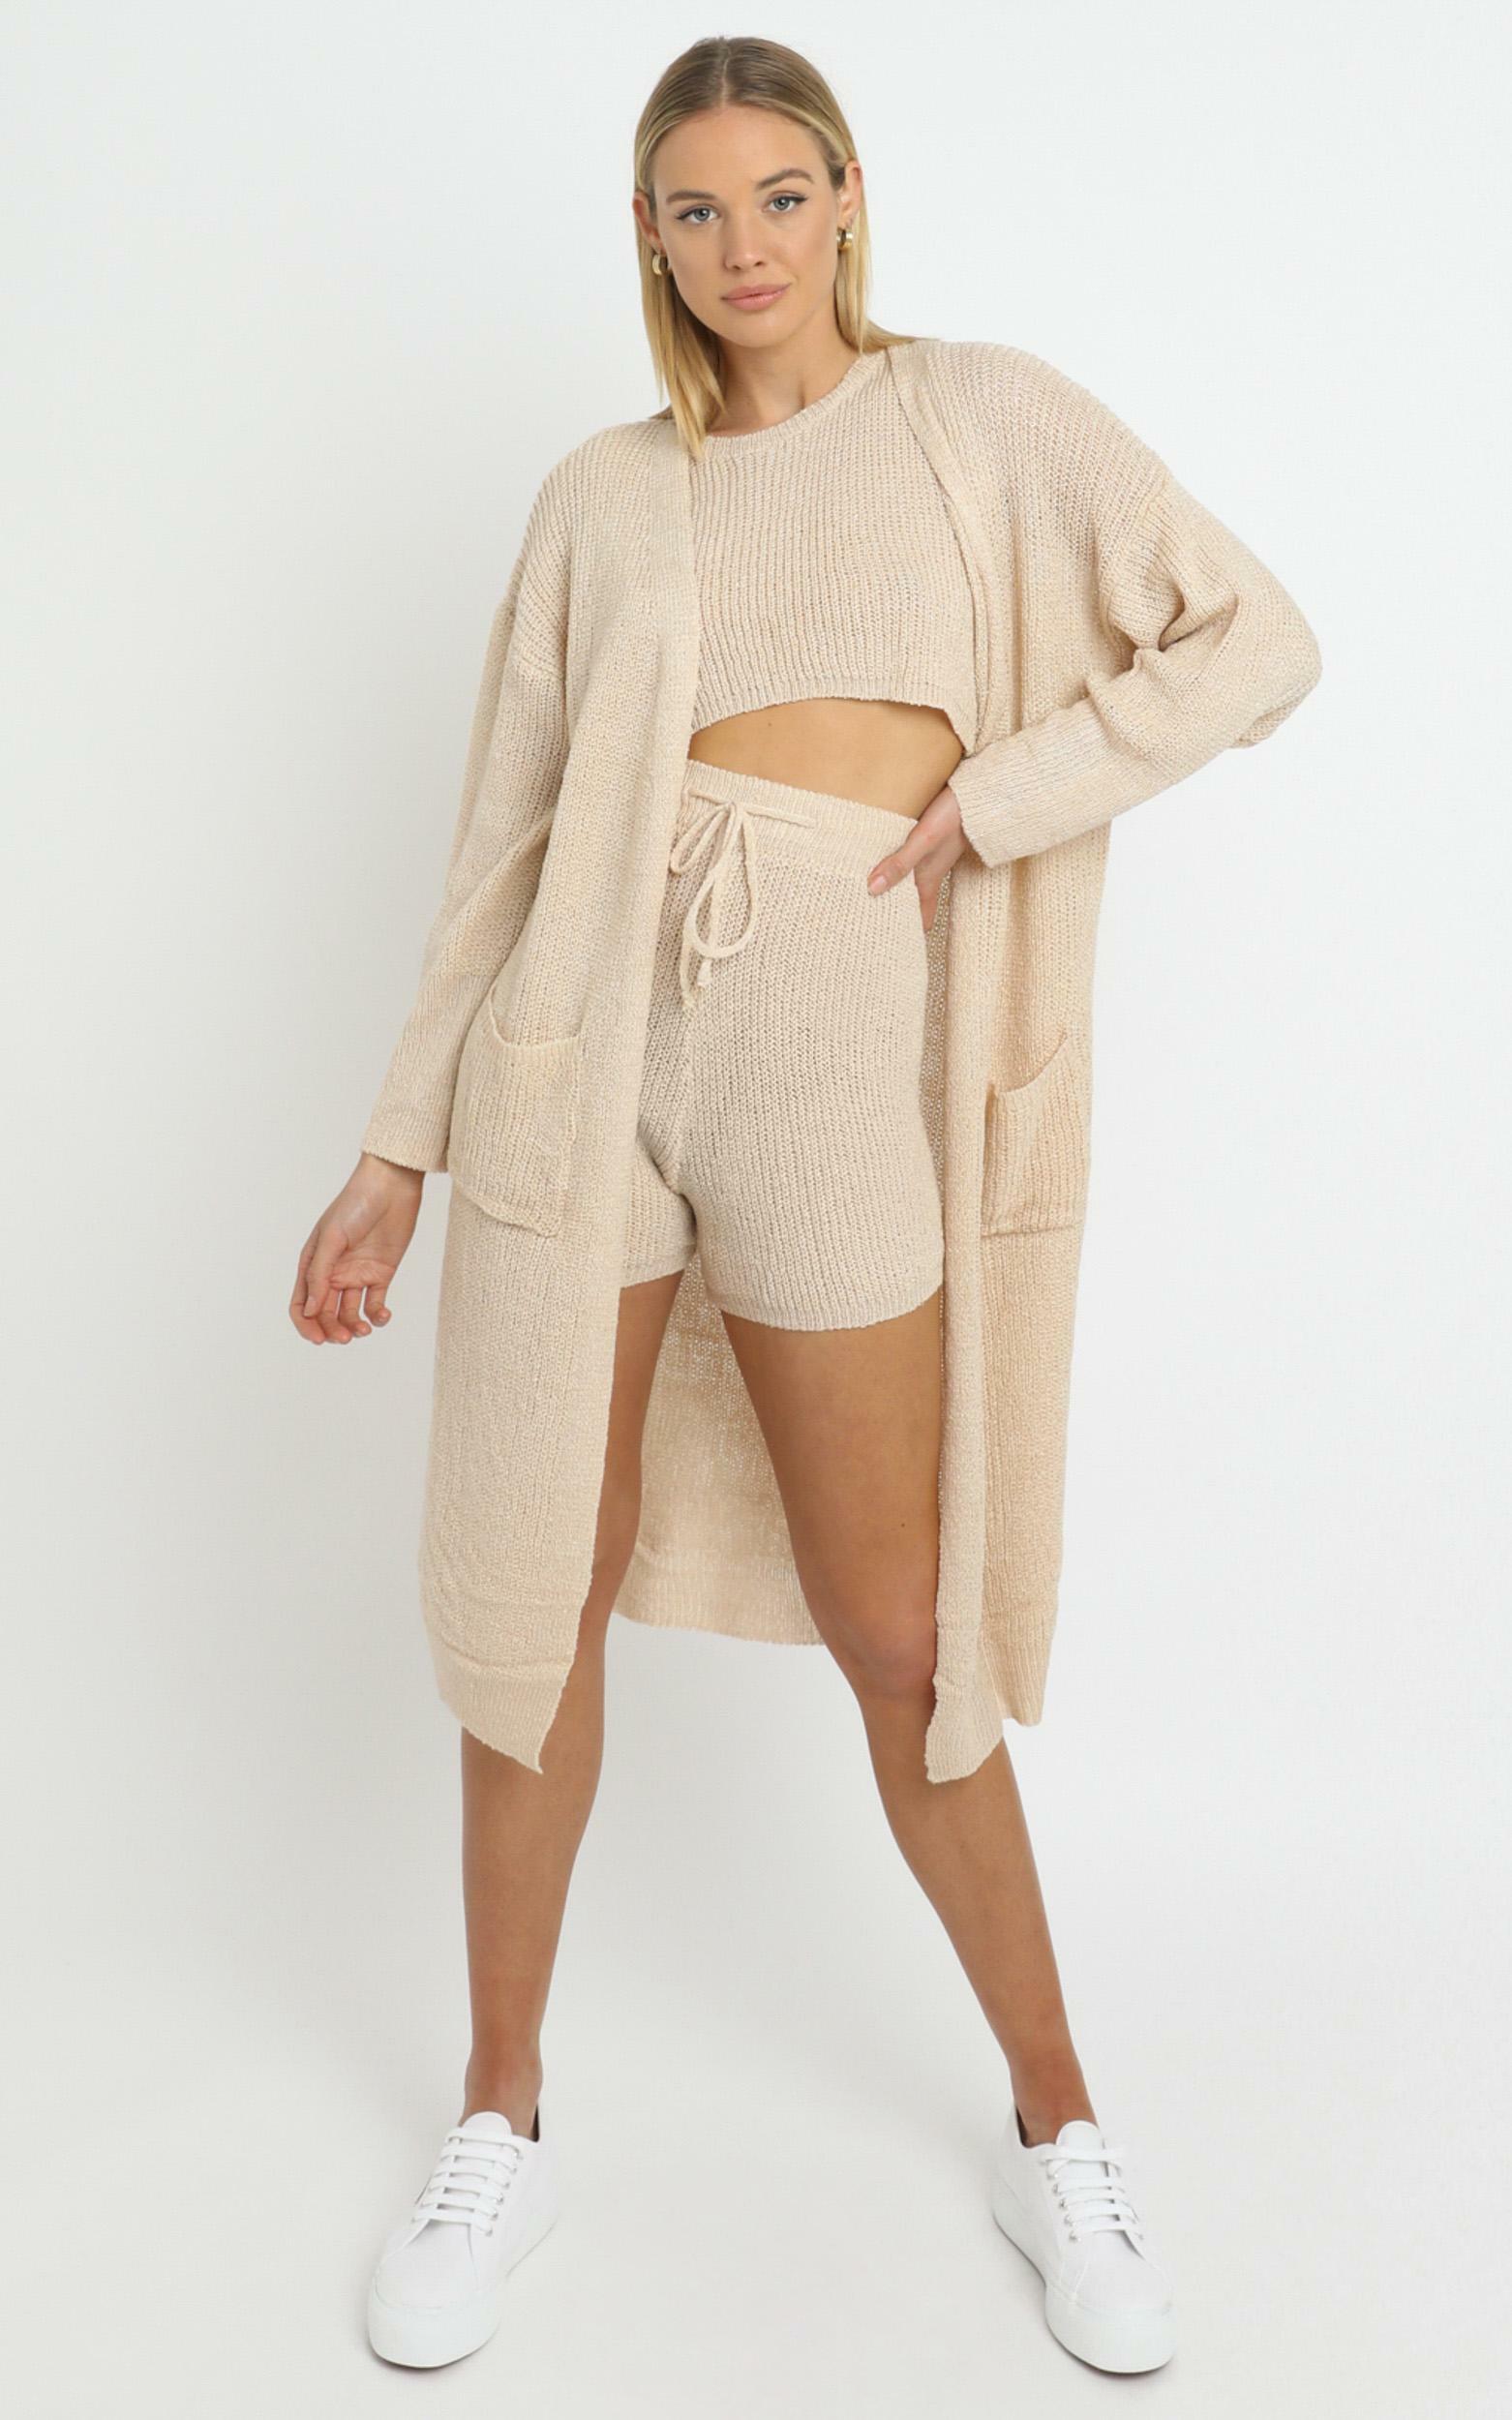 Saffron Knit Three Piece Set Beige - L/XL, Cream, hi-res image number null